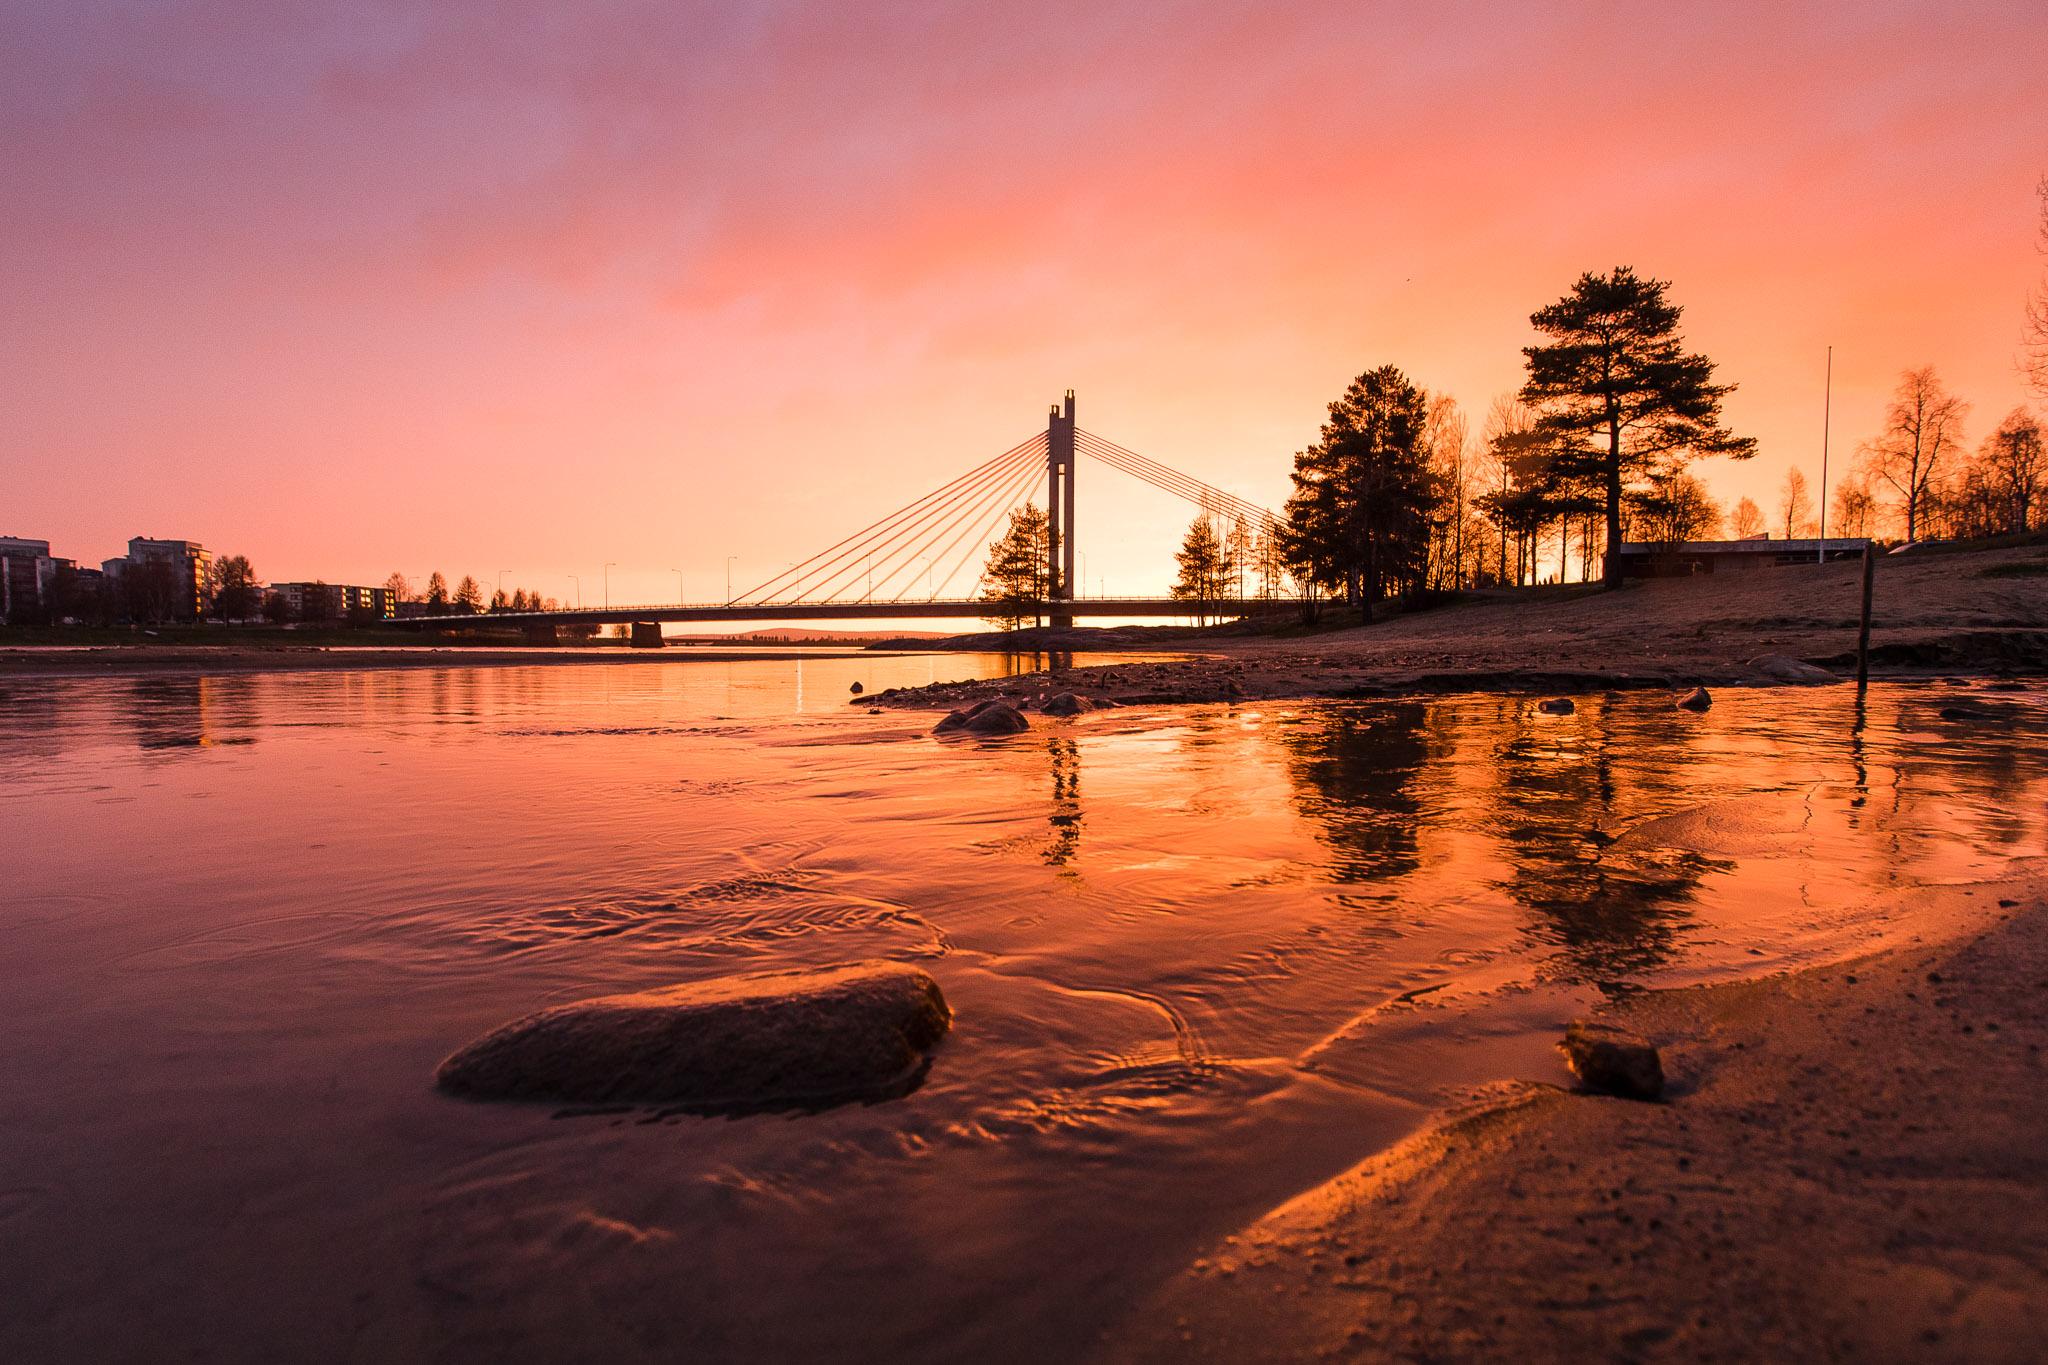 Lumberjacks candle bridge under the midnight sun in Rovaniemi Lapland